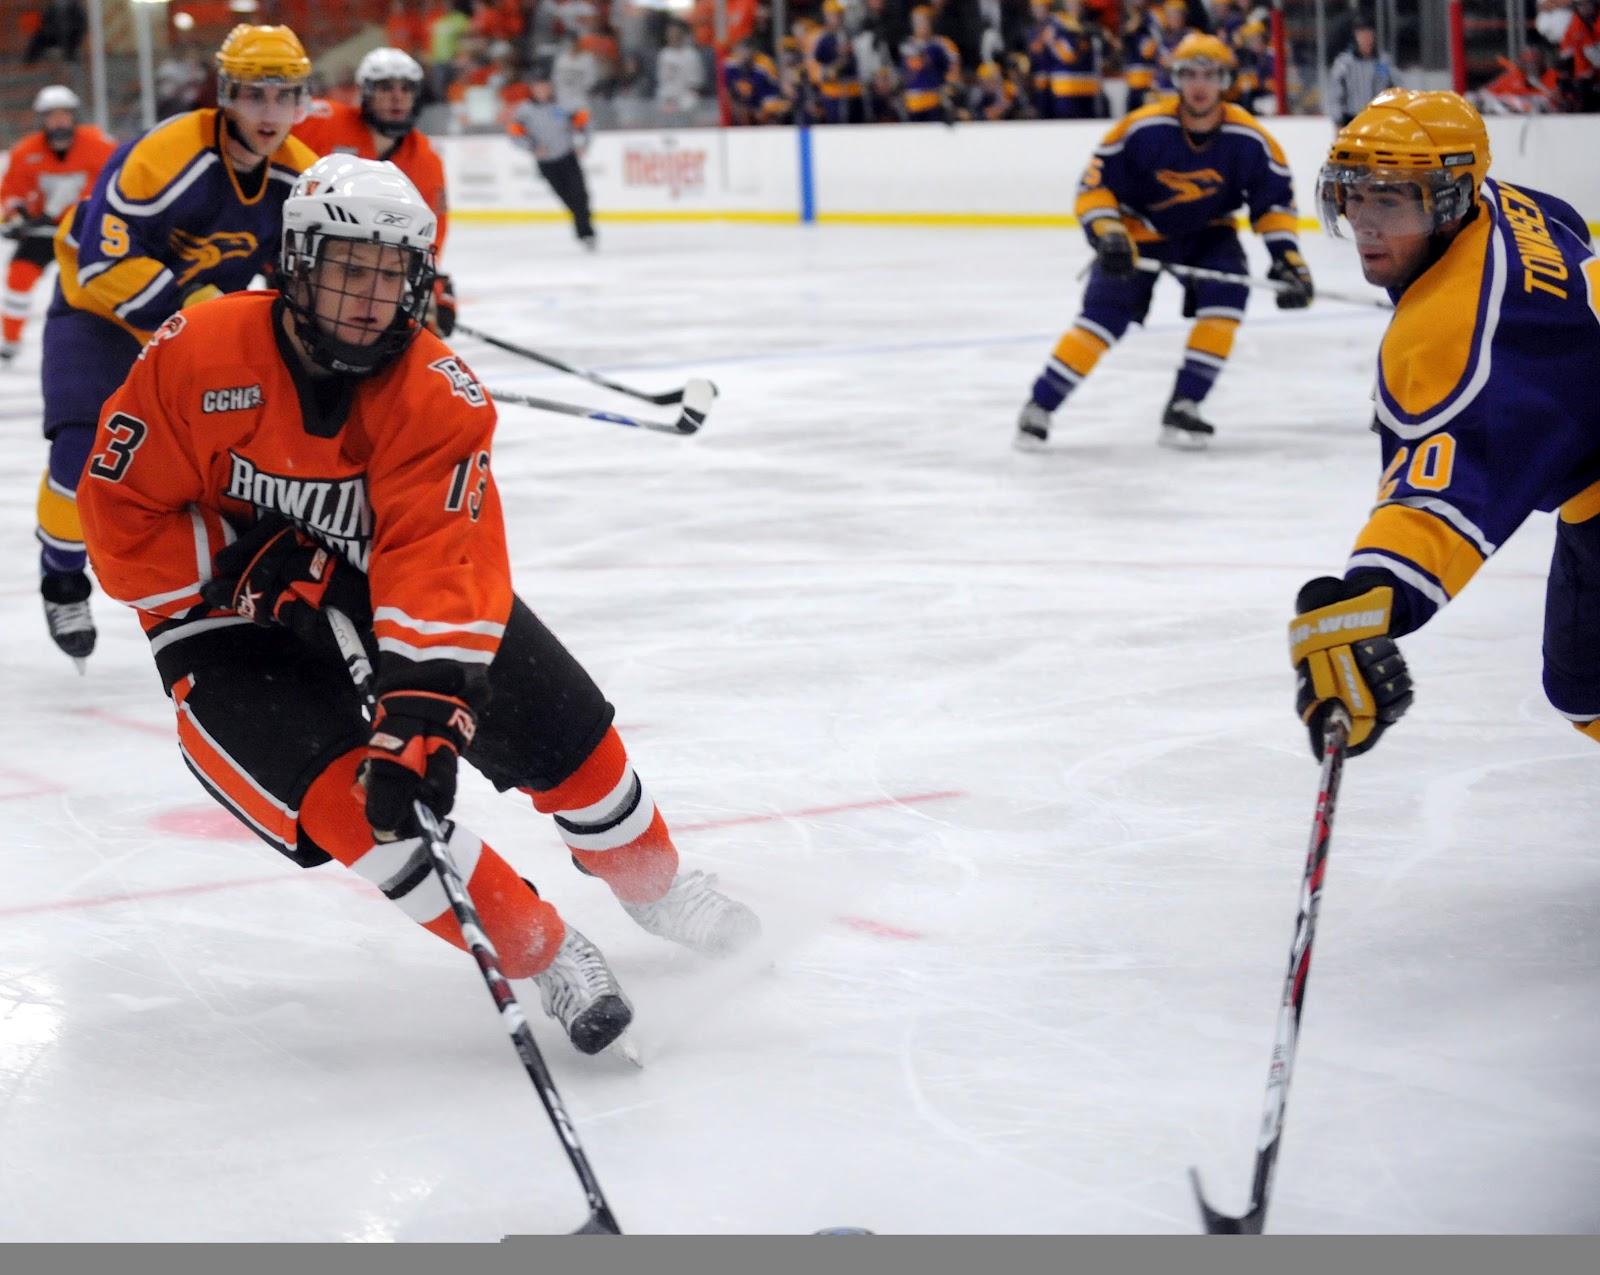 Funny Pictures Gallery: Hockey, tsn hockey, hockey games ... Hockey